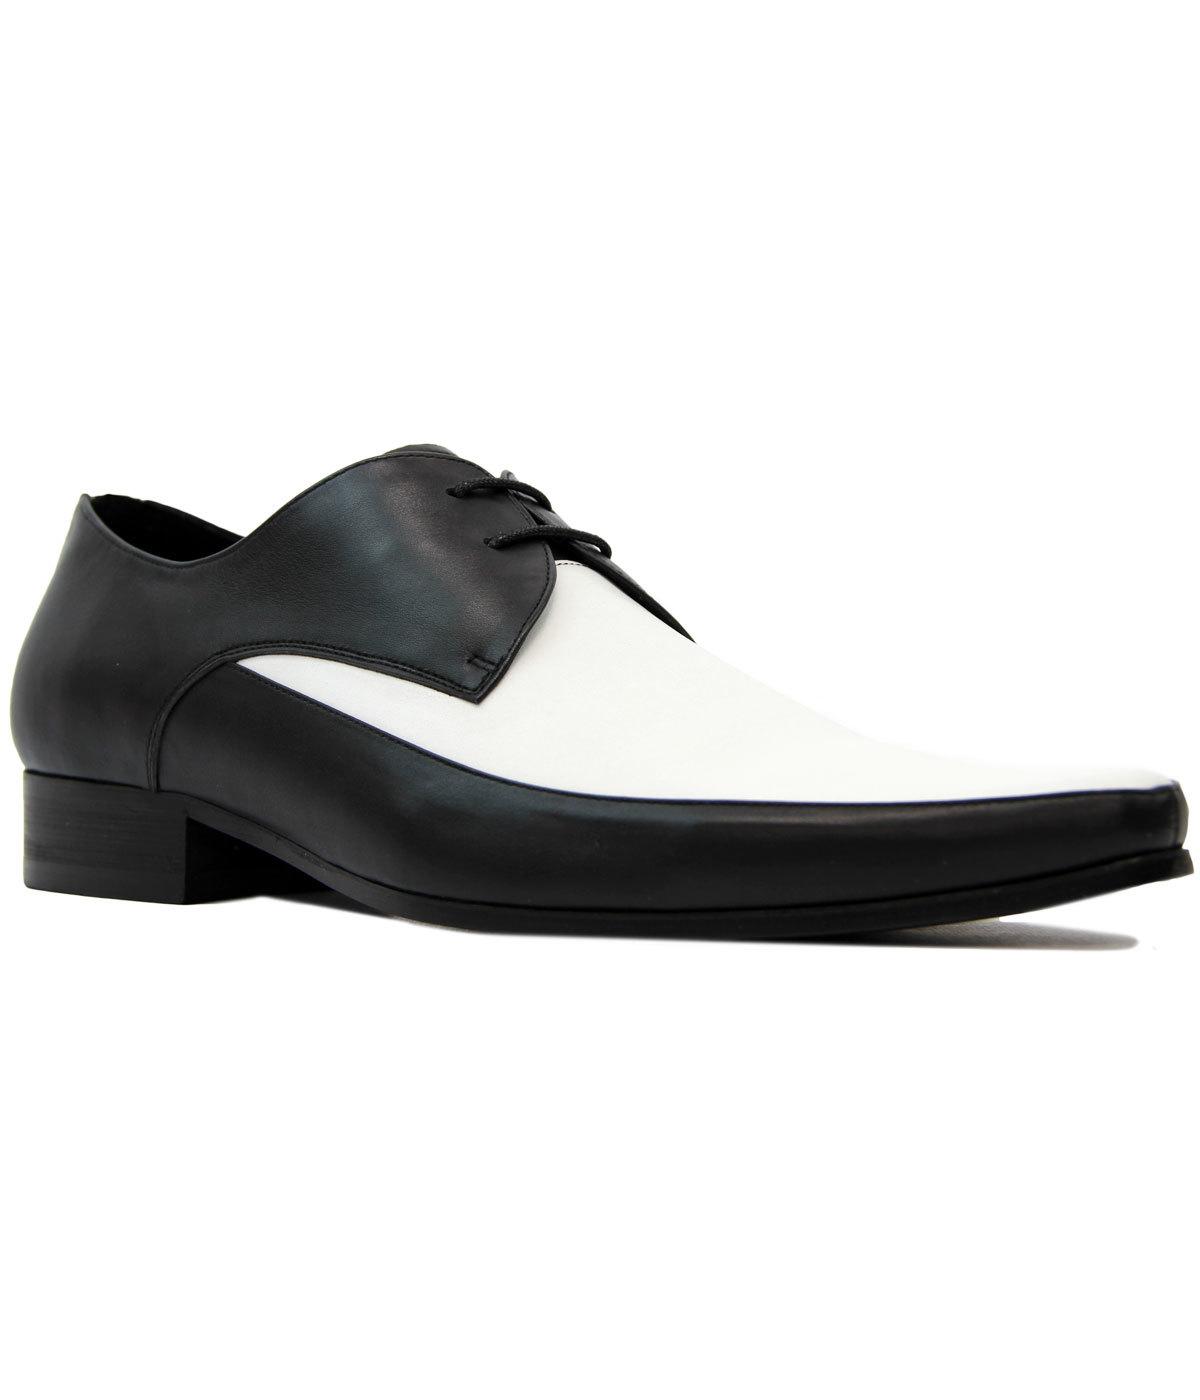 Weller MADCAP ENGLAND 1960s Mod Jam Gibson Shoes